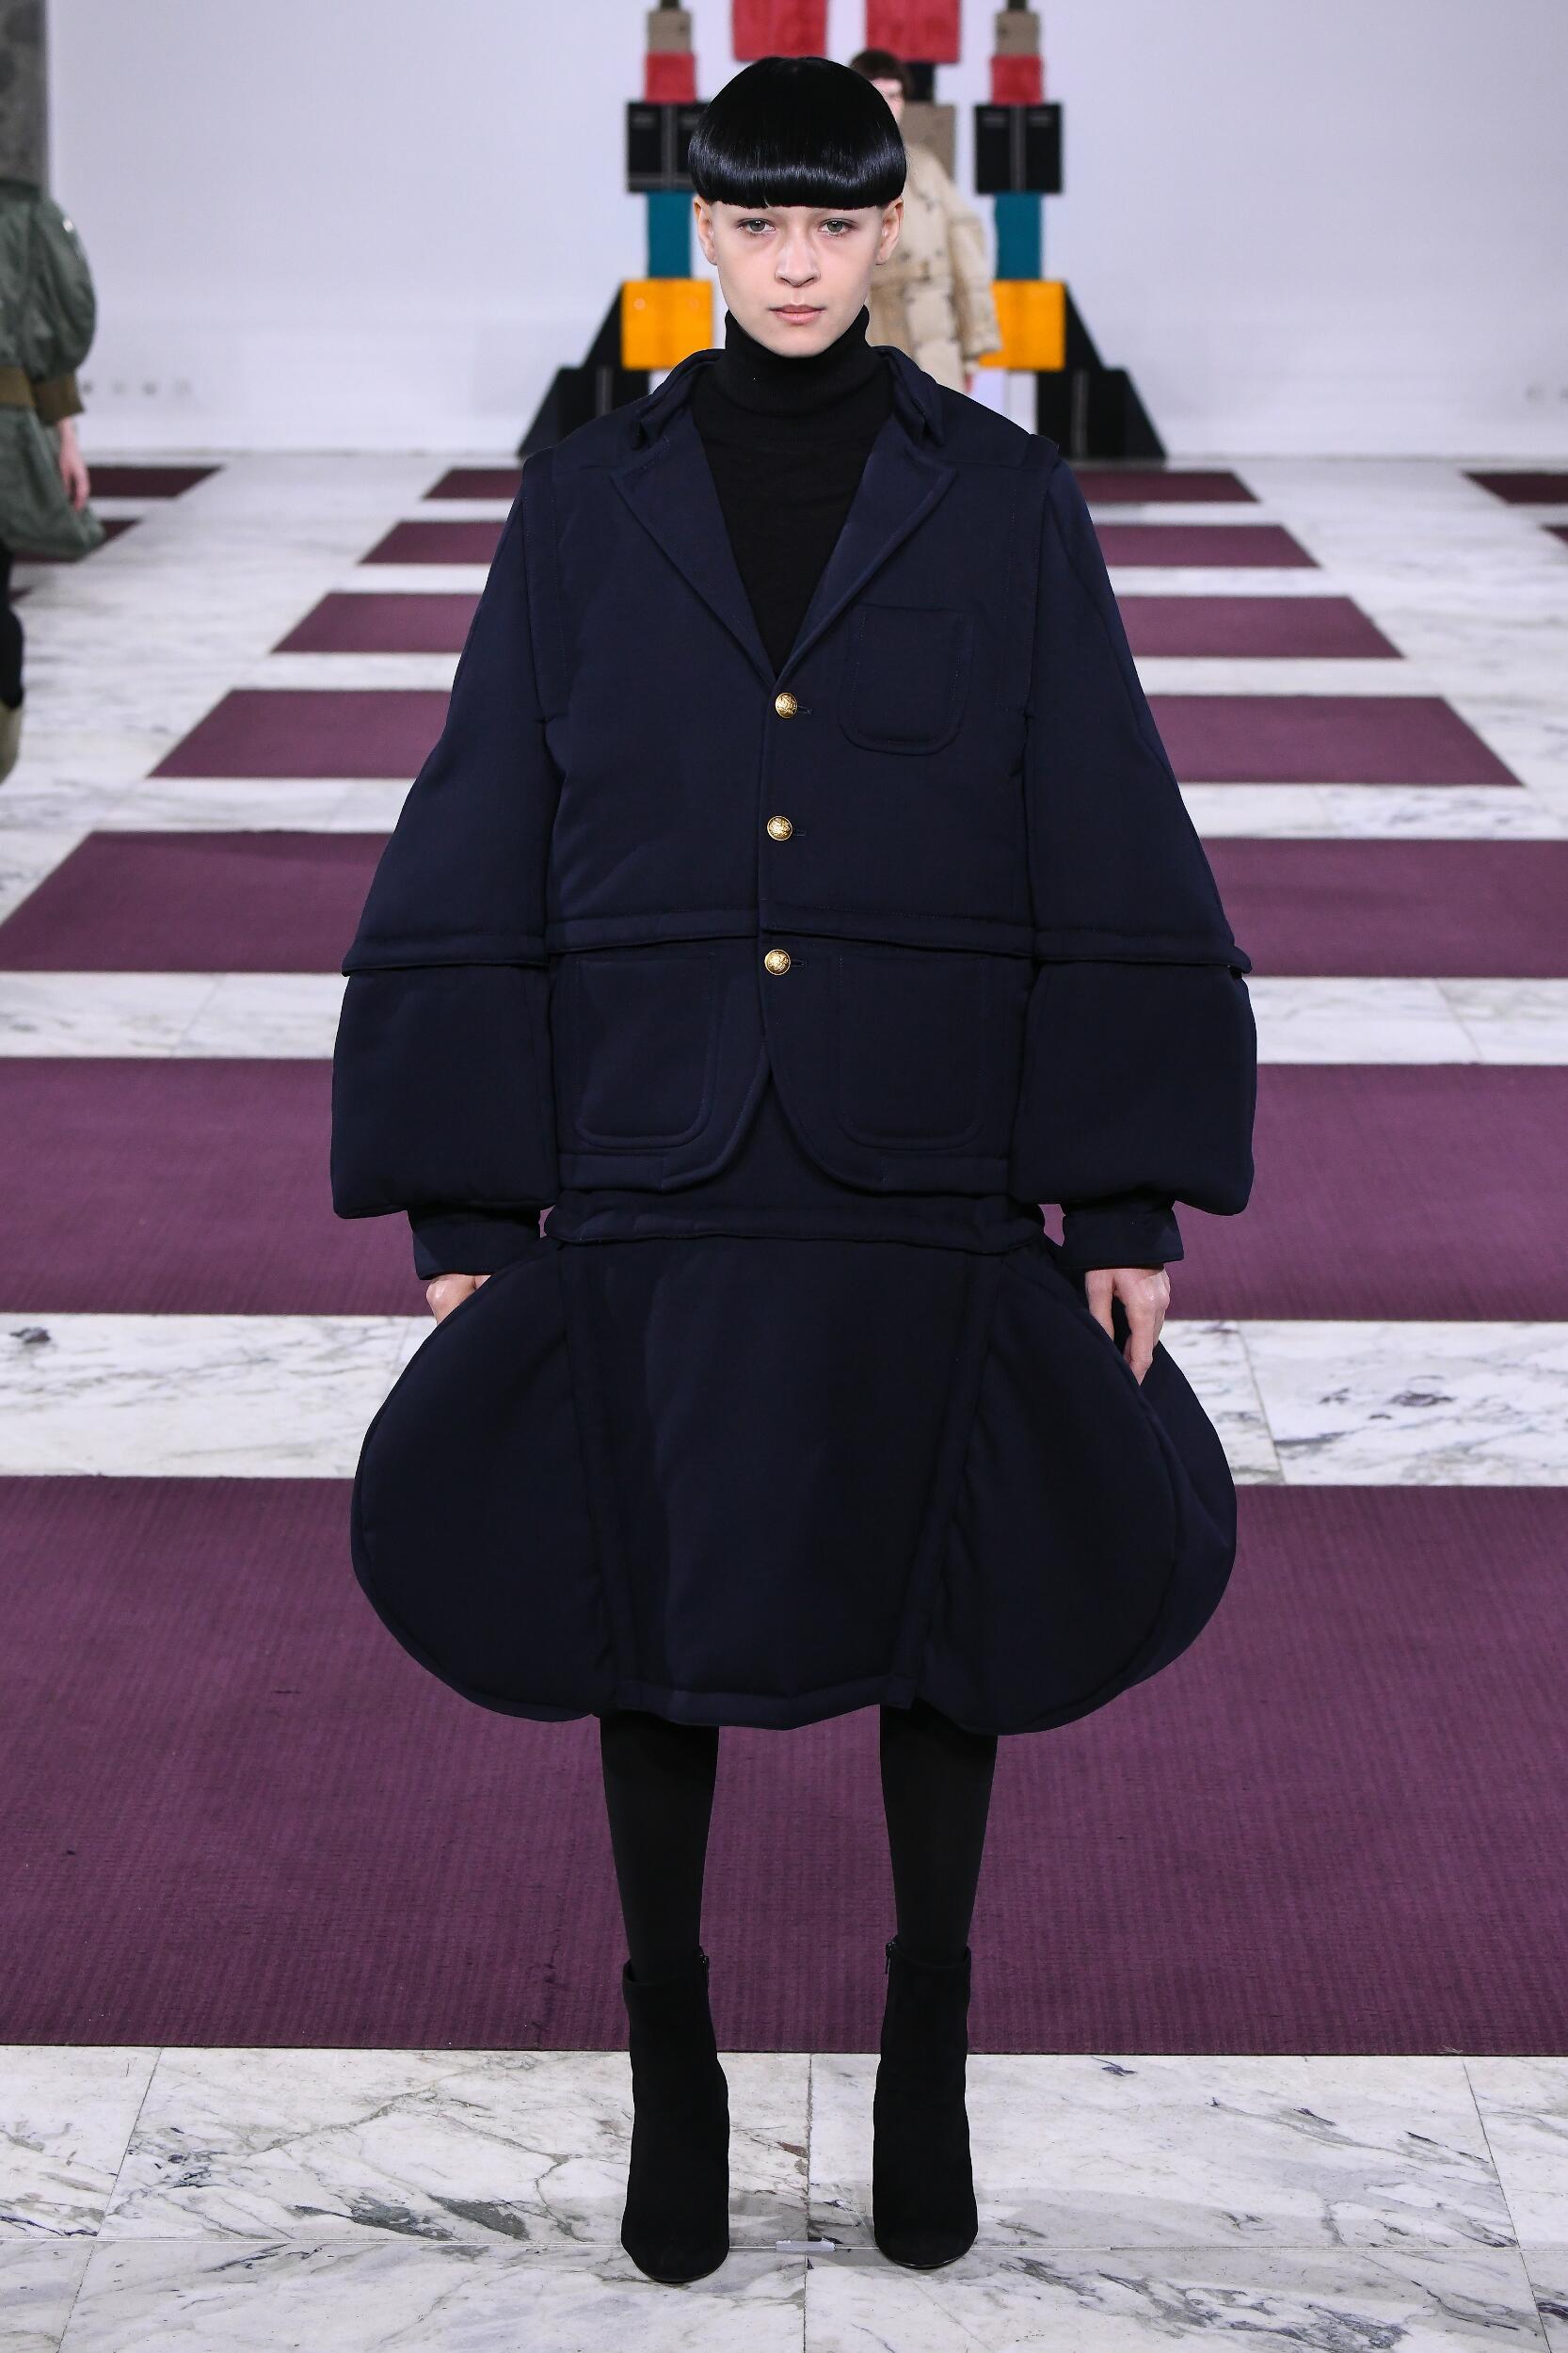 FW 2020-21 Anrealage Fashion Show